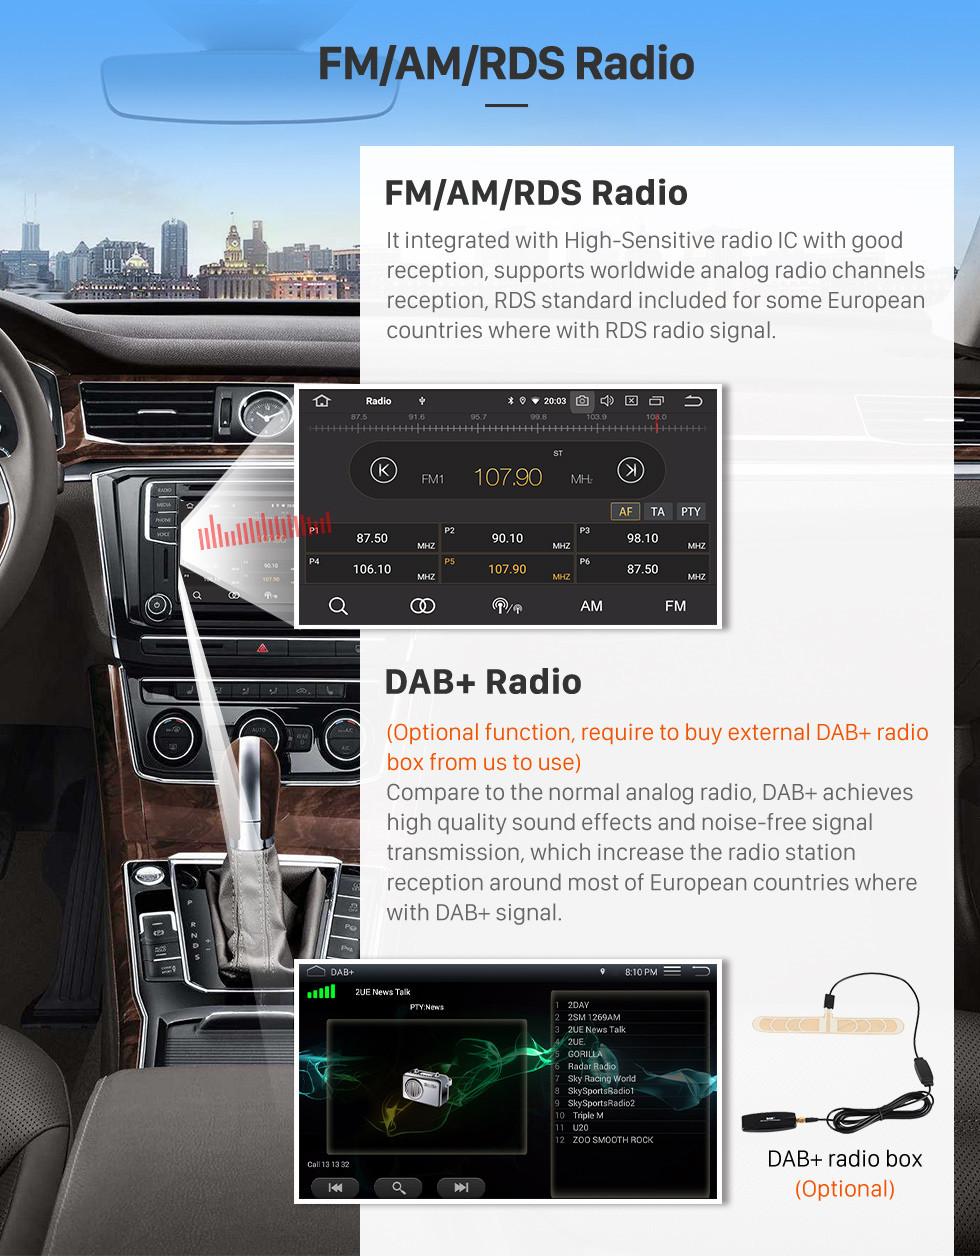 Seicane 2006-2010 Mazda BT-50 Android 9.0 9 pulgadas Navegación GPS Radio Bluetooth HD Pantalla táctil Compatibilidad USB Carplay TPMS DAB + 1080P Cámara de respaldo de video